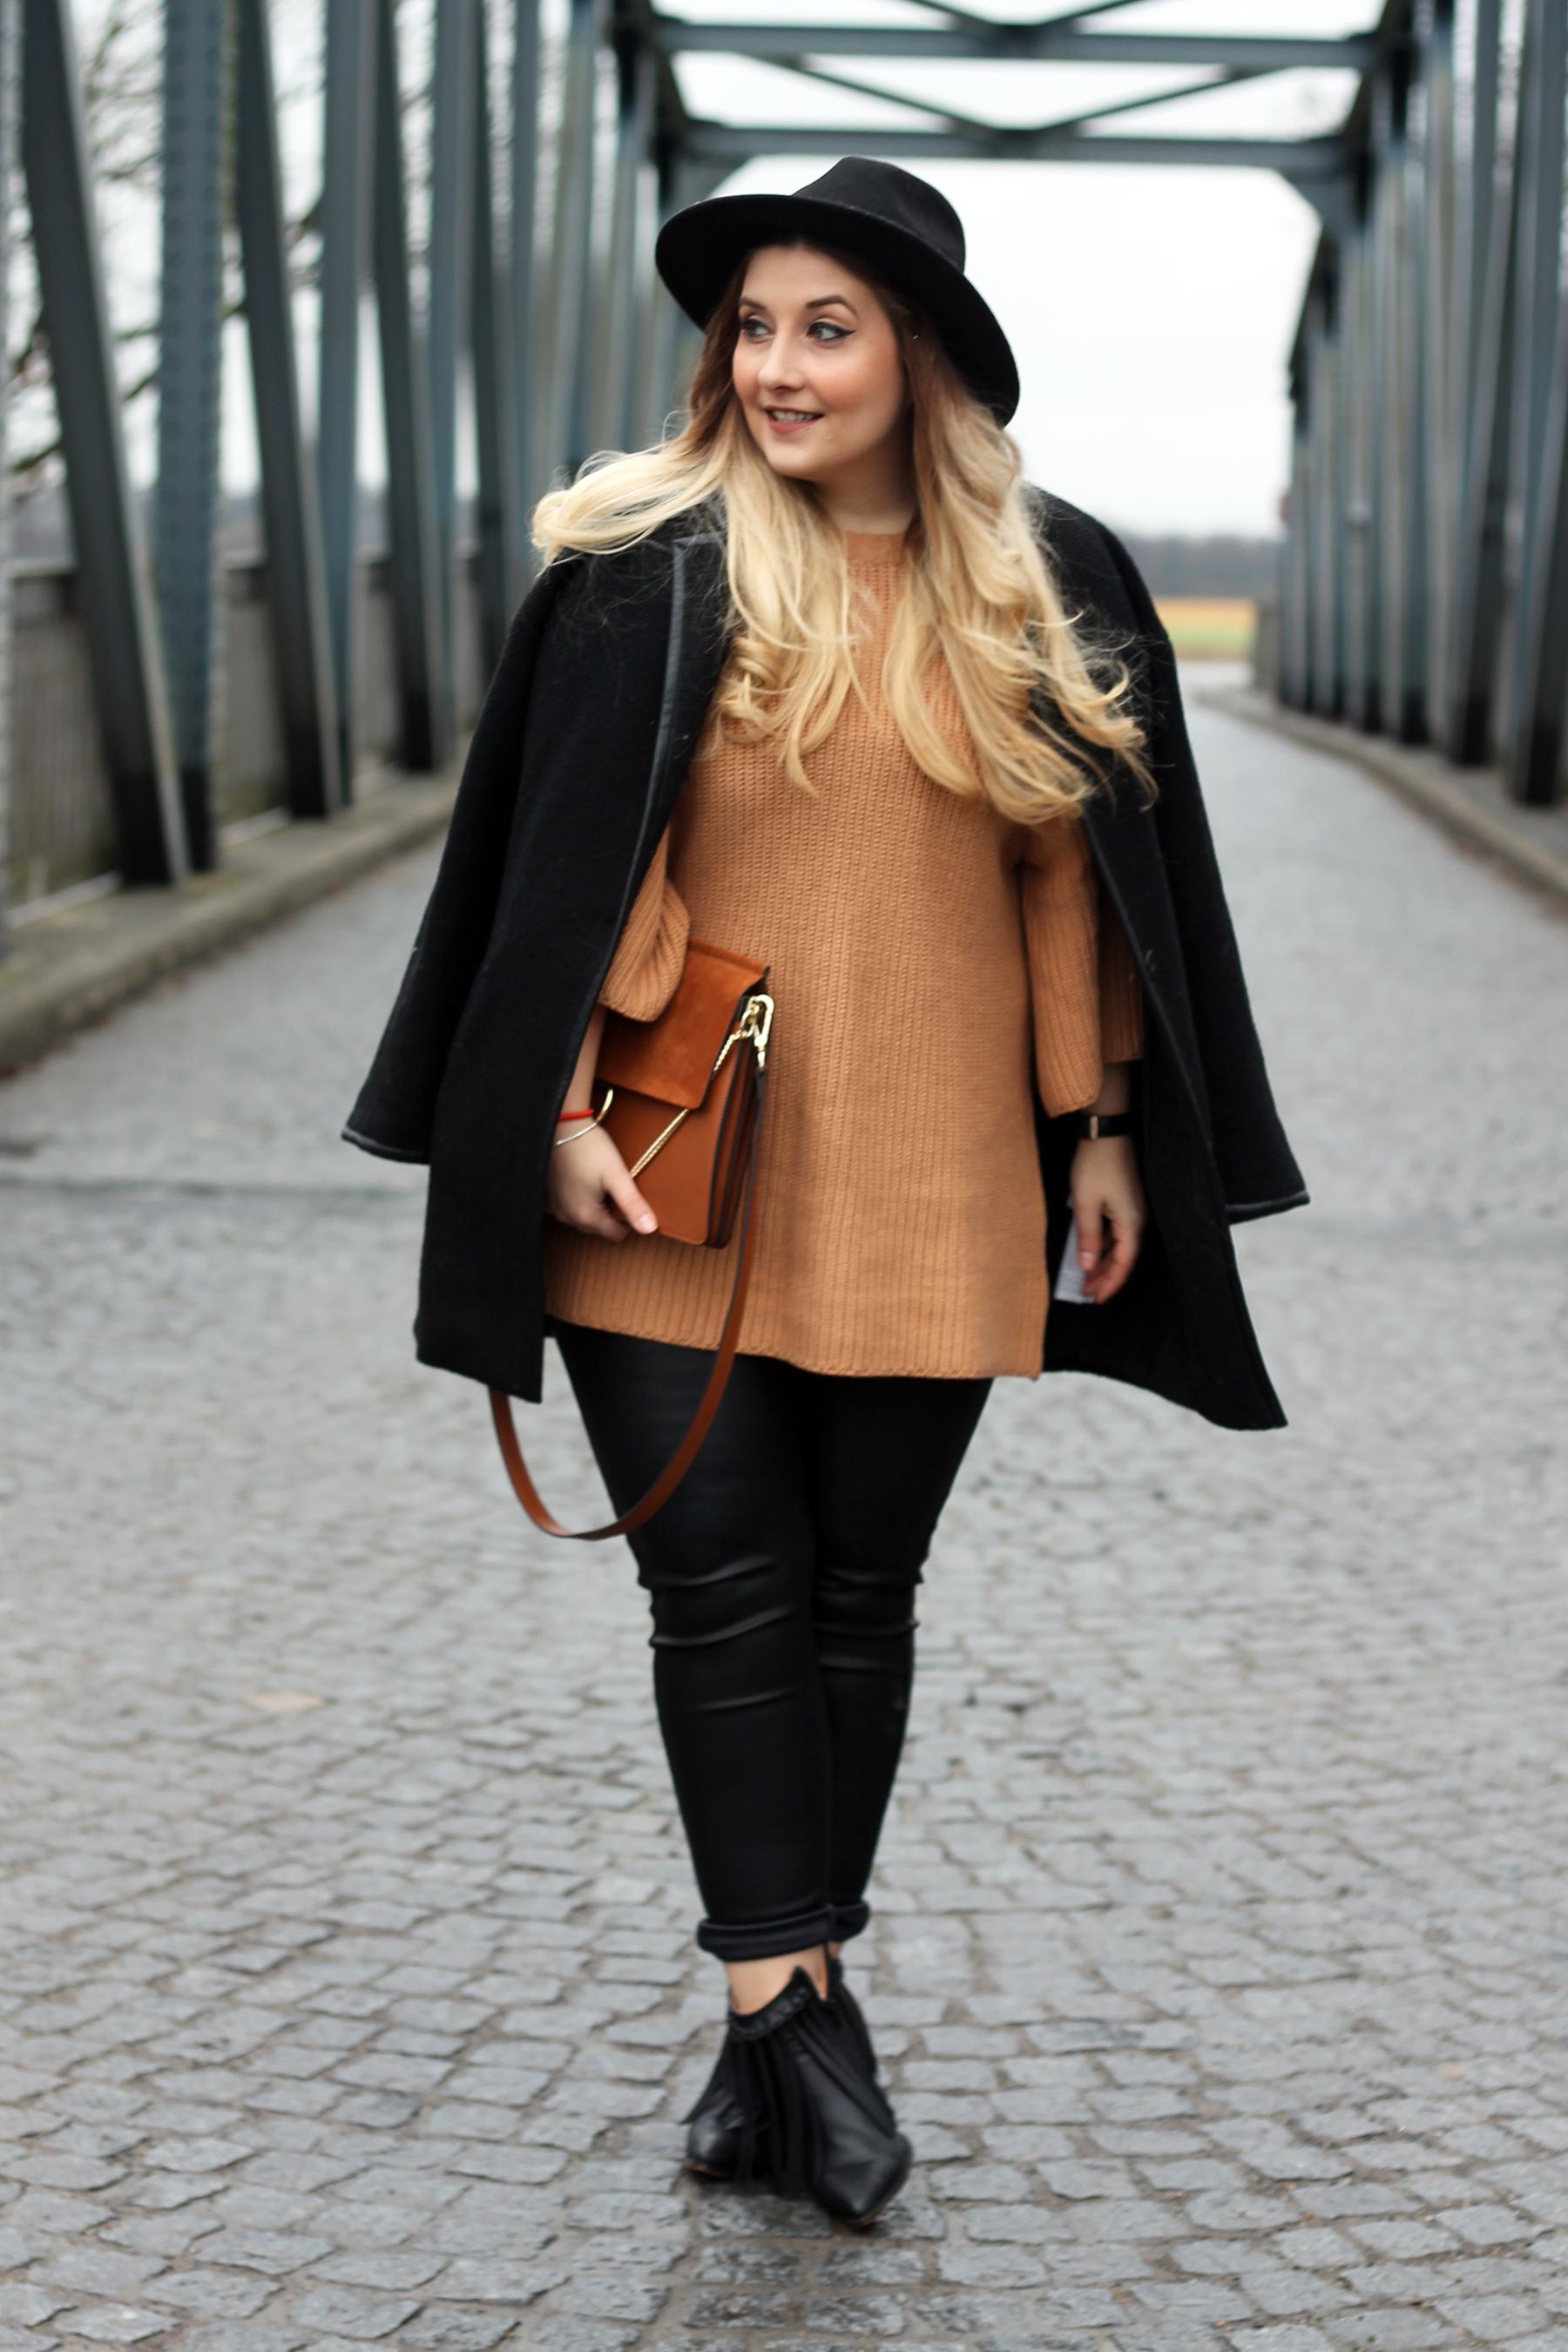 outfit-look-.style-modeblog-fashionblog-top-deutschland-berlin-hamburg